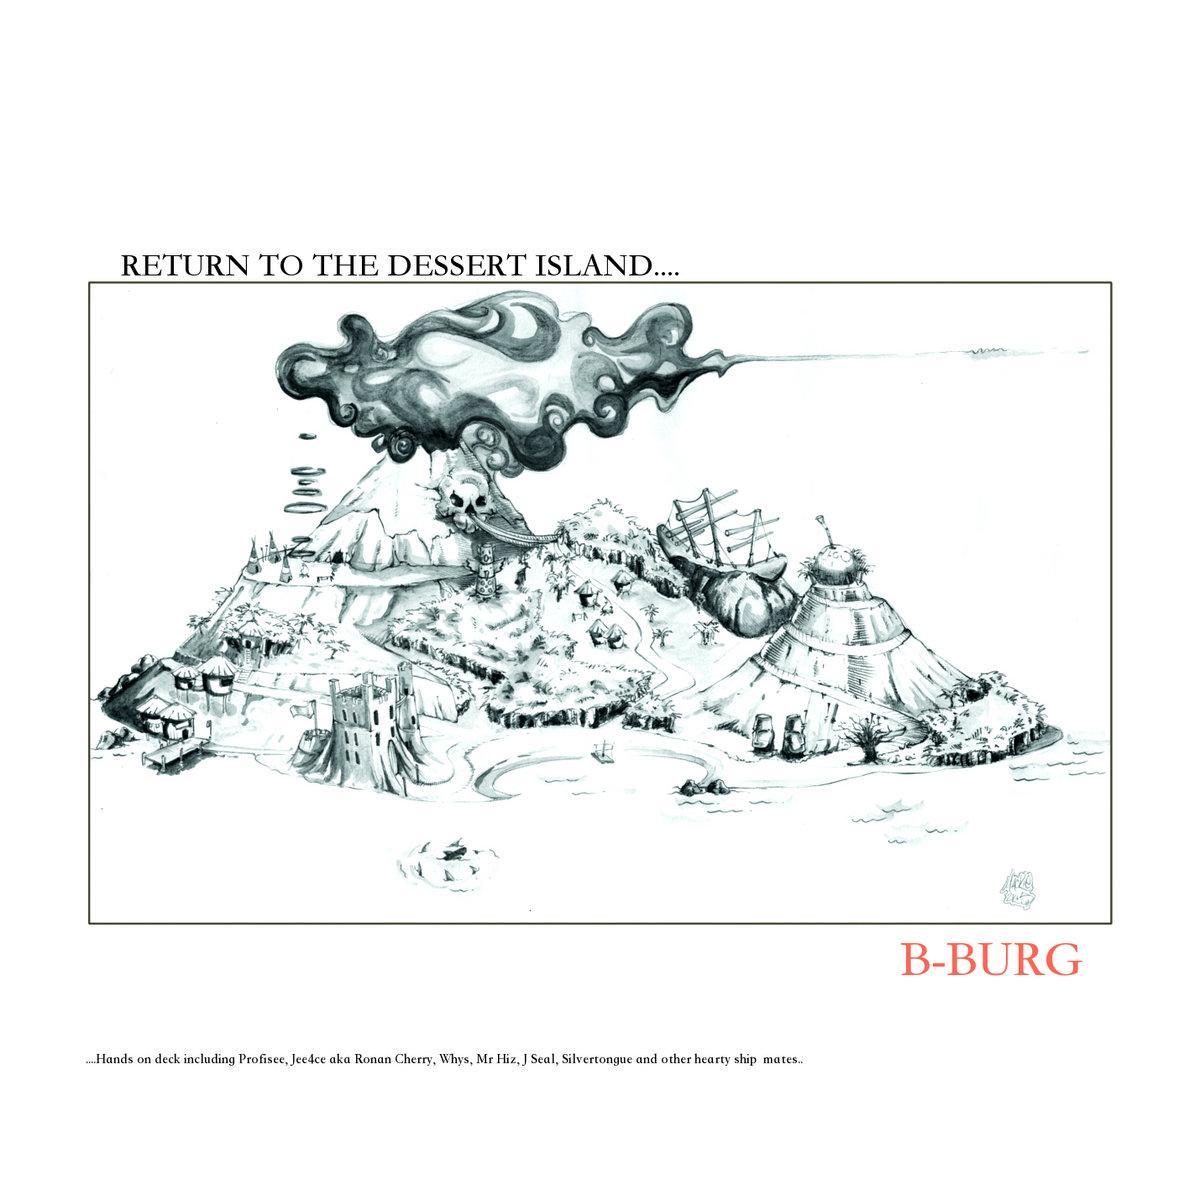 B-Burg – Return To The Dessert Island – AlbumHighlight.